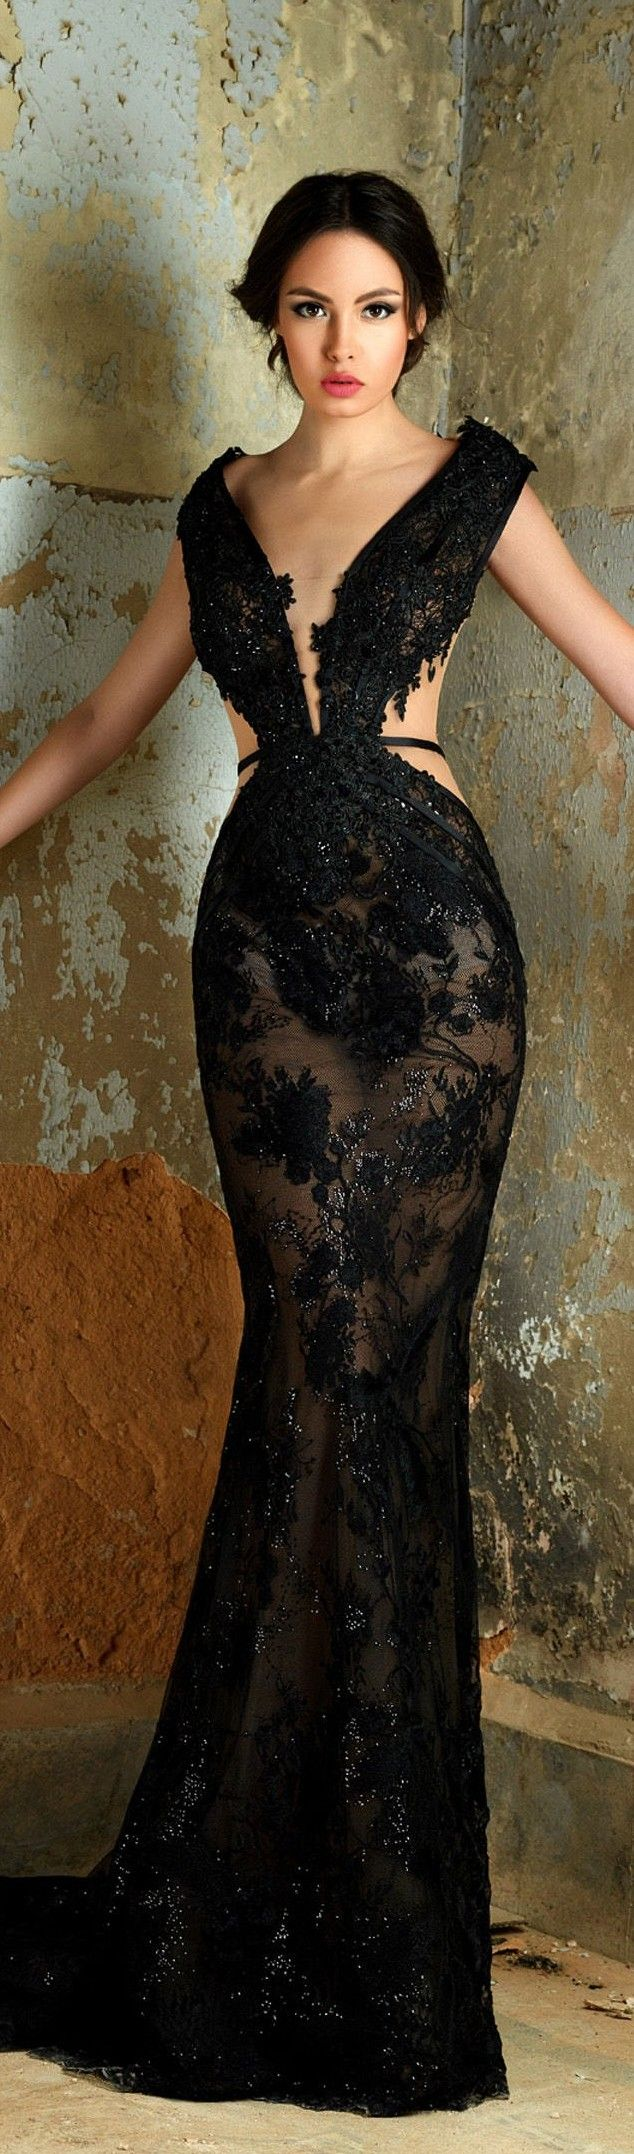 Hanna toumajean couture fw vestidos pinterest couture